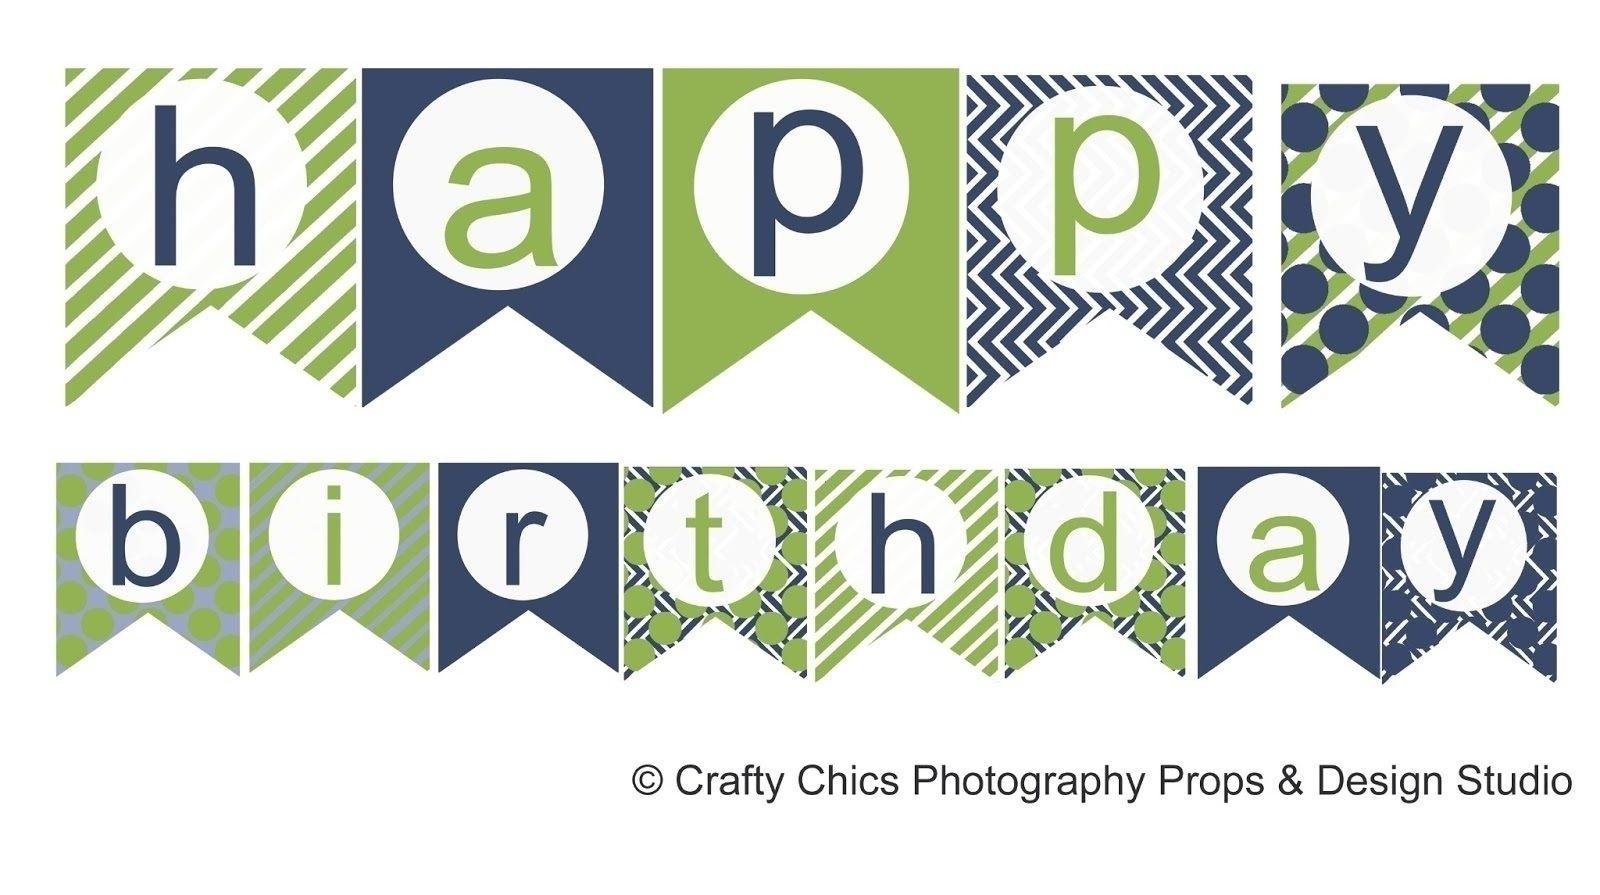 Happy Birthday Banner Template Printable   World Of Label - Birthday Banner Templates Free Printable